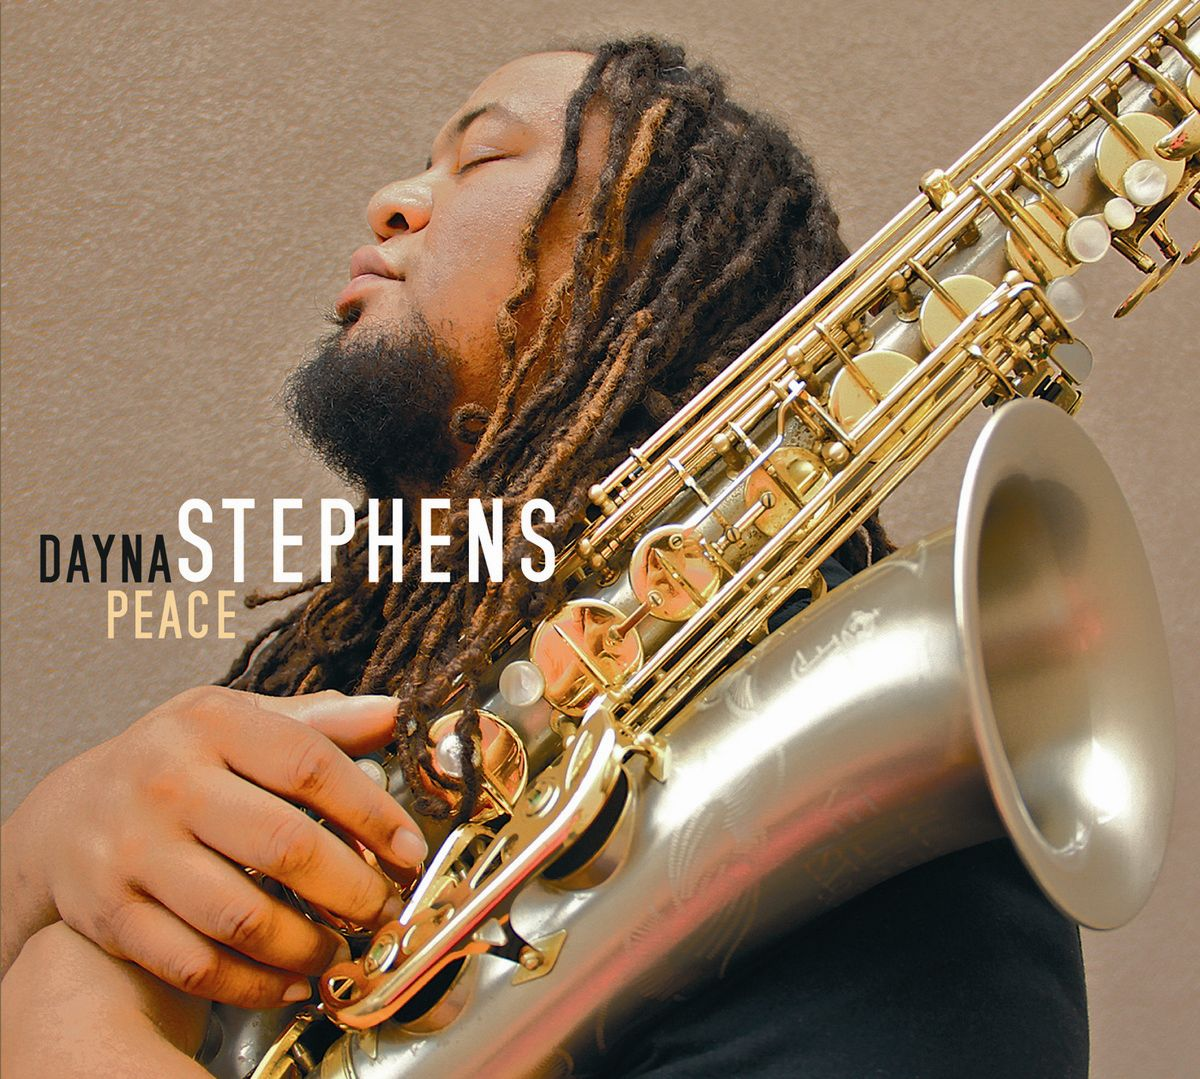 Dayna Stephens – Peace